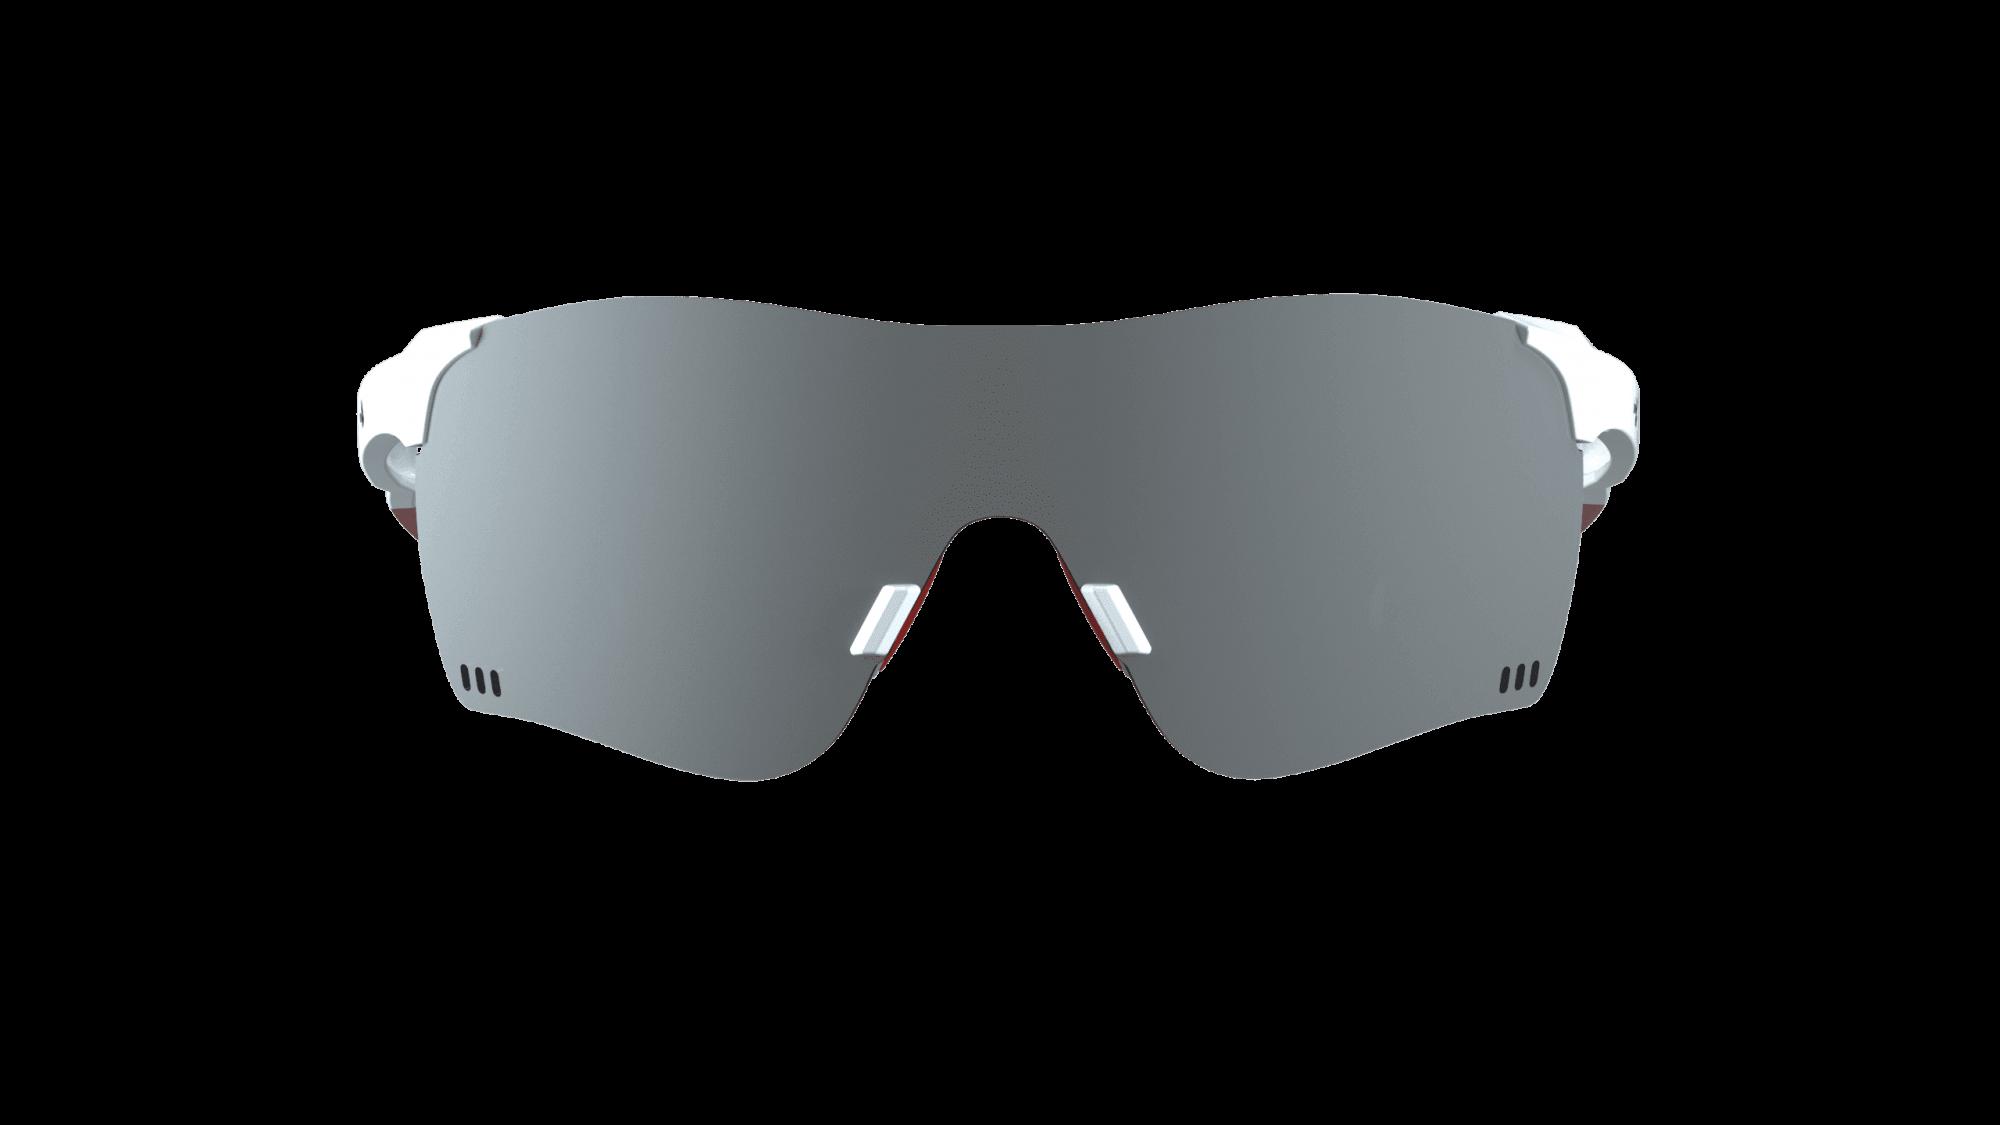 Óculos Quad F HB Pearled White Silver